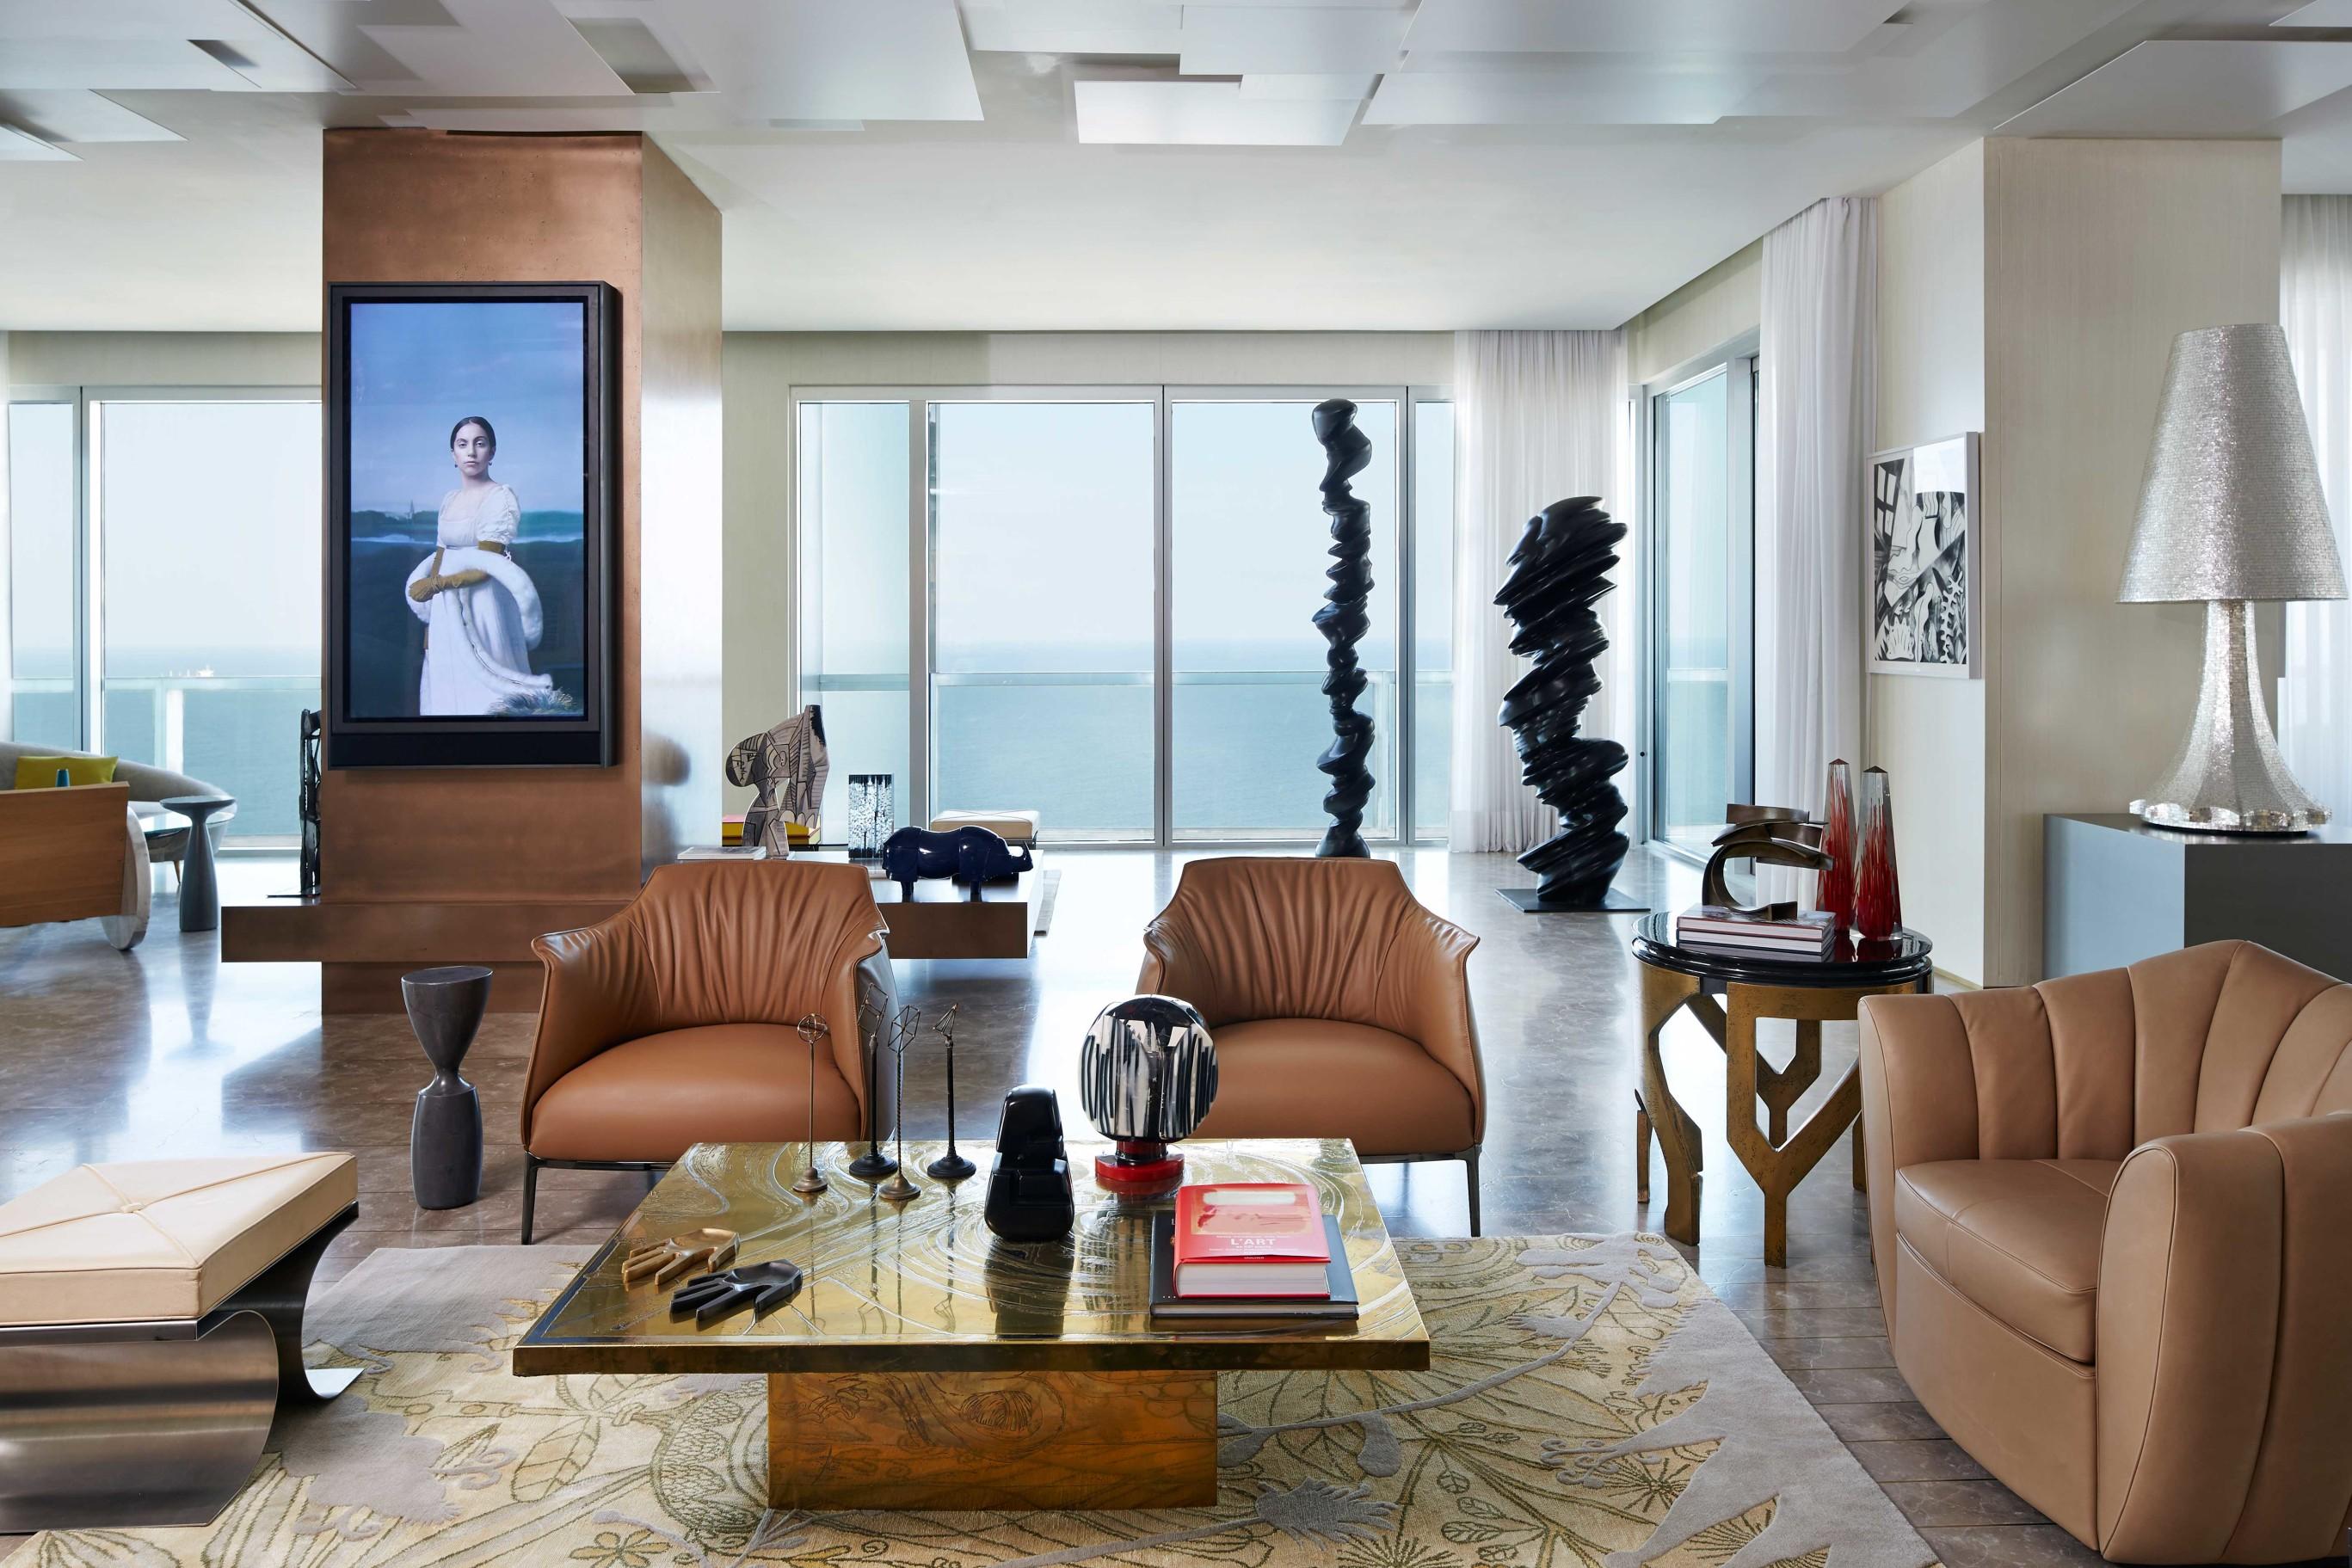 Gatserelia Design - Private Residence - Top residential interior designers